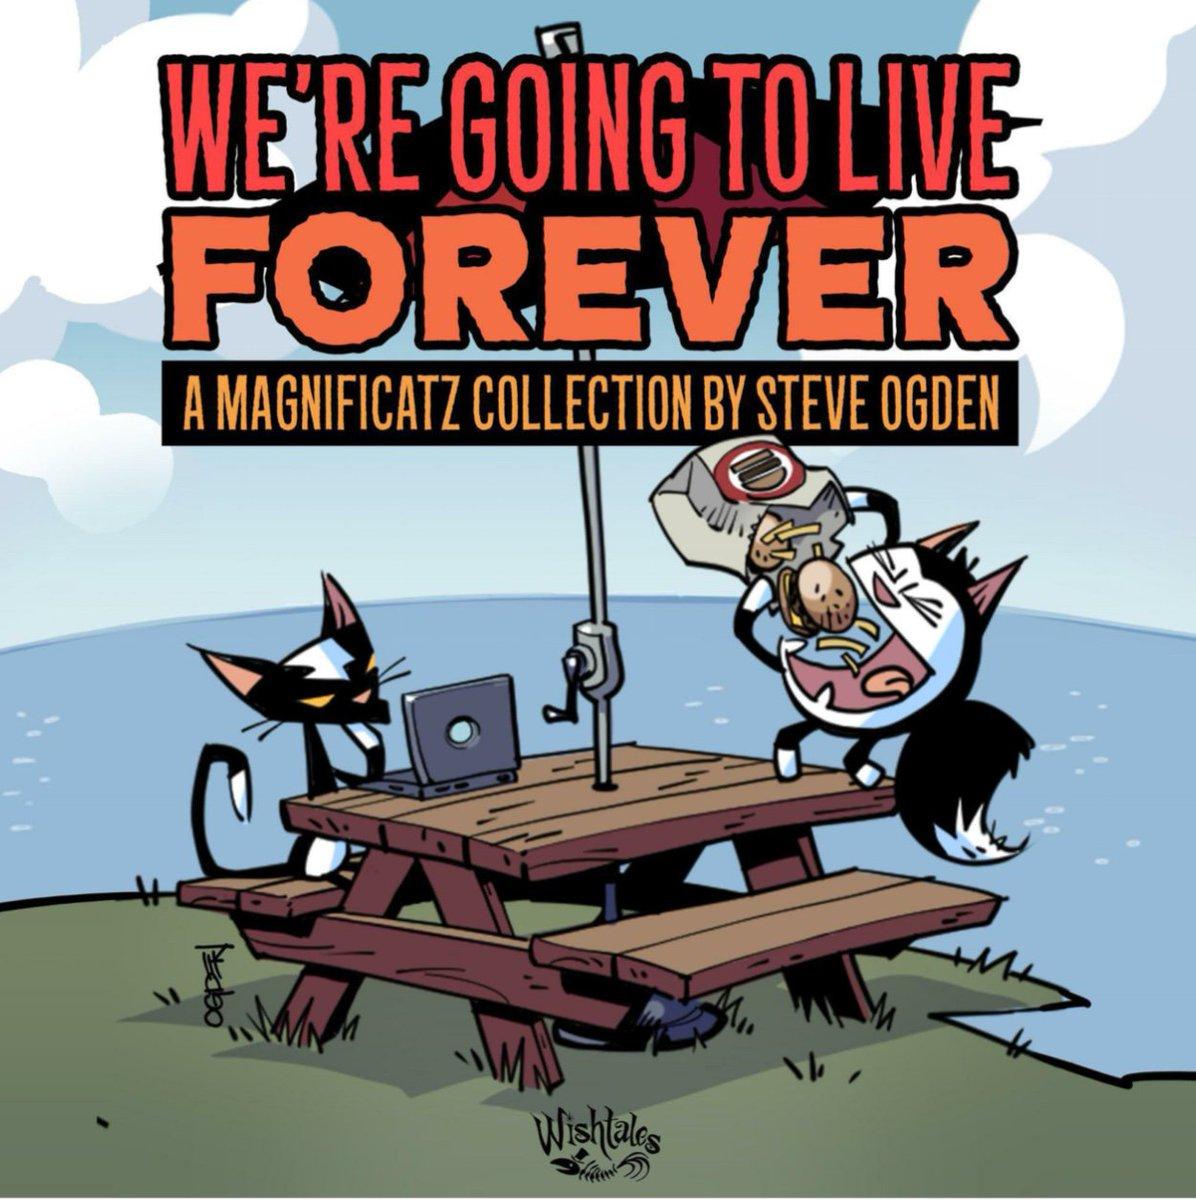 Magnificatz eCollection reviewed.  http:// wp.me/P6PeB7-r8  &nbsp;   @SteveOgdenArt  http:// amzn.to/2m7unFi  &nbsp;   #comics #Humor <br>http://pic.twitter.com/CICHRN69YT